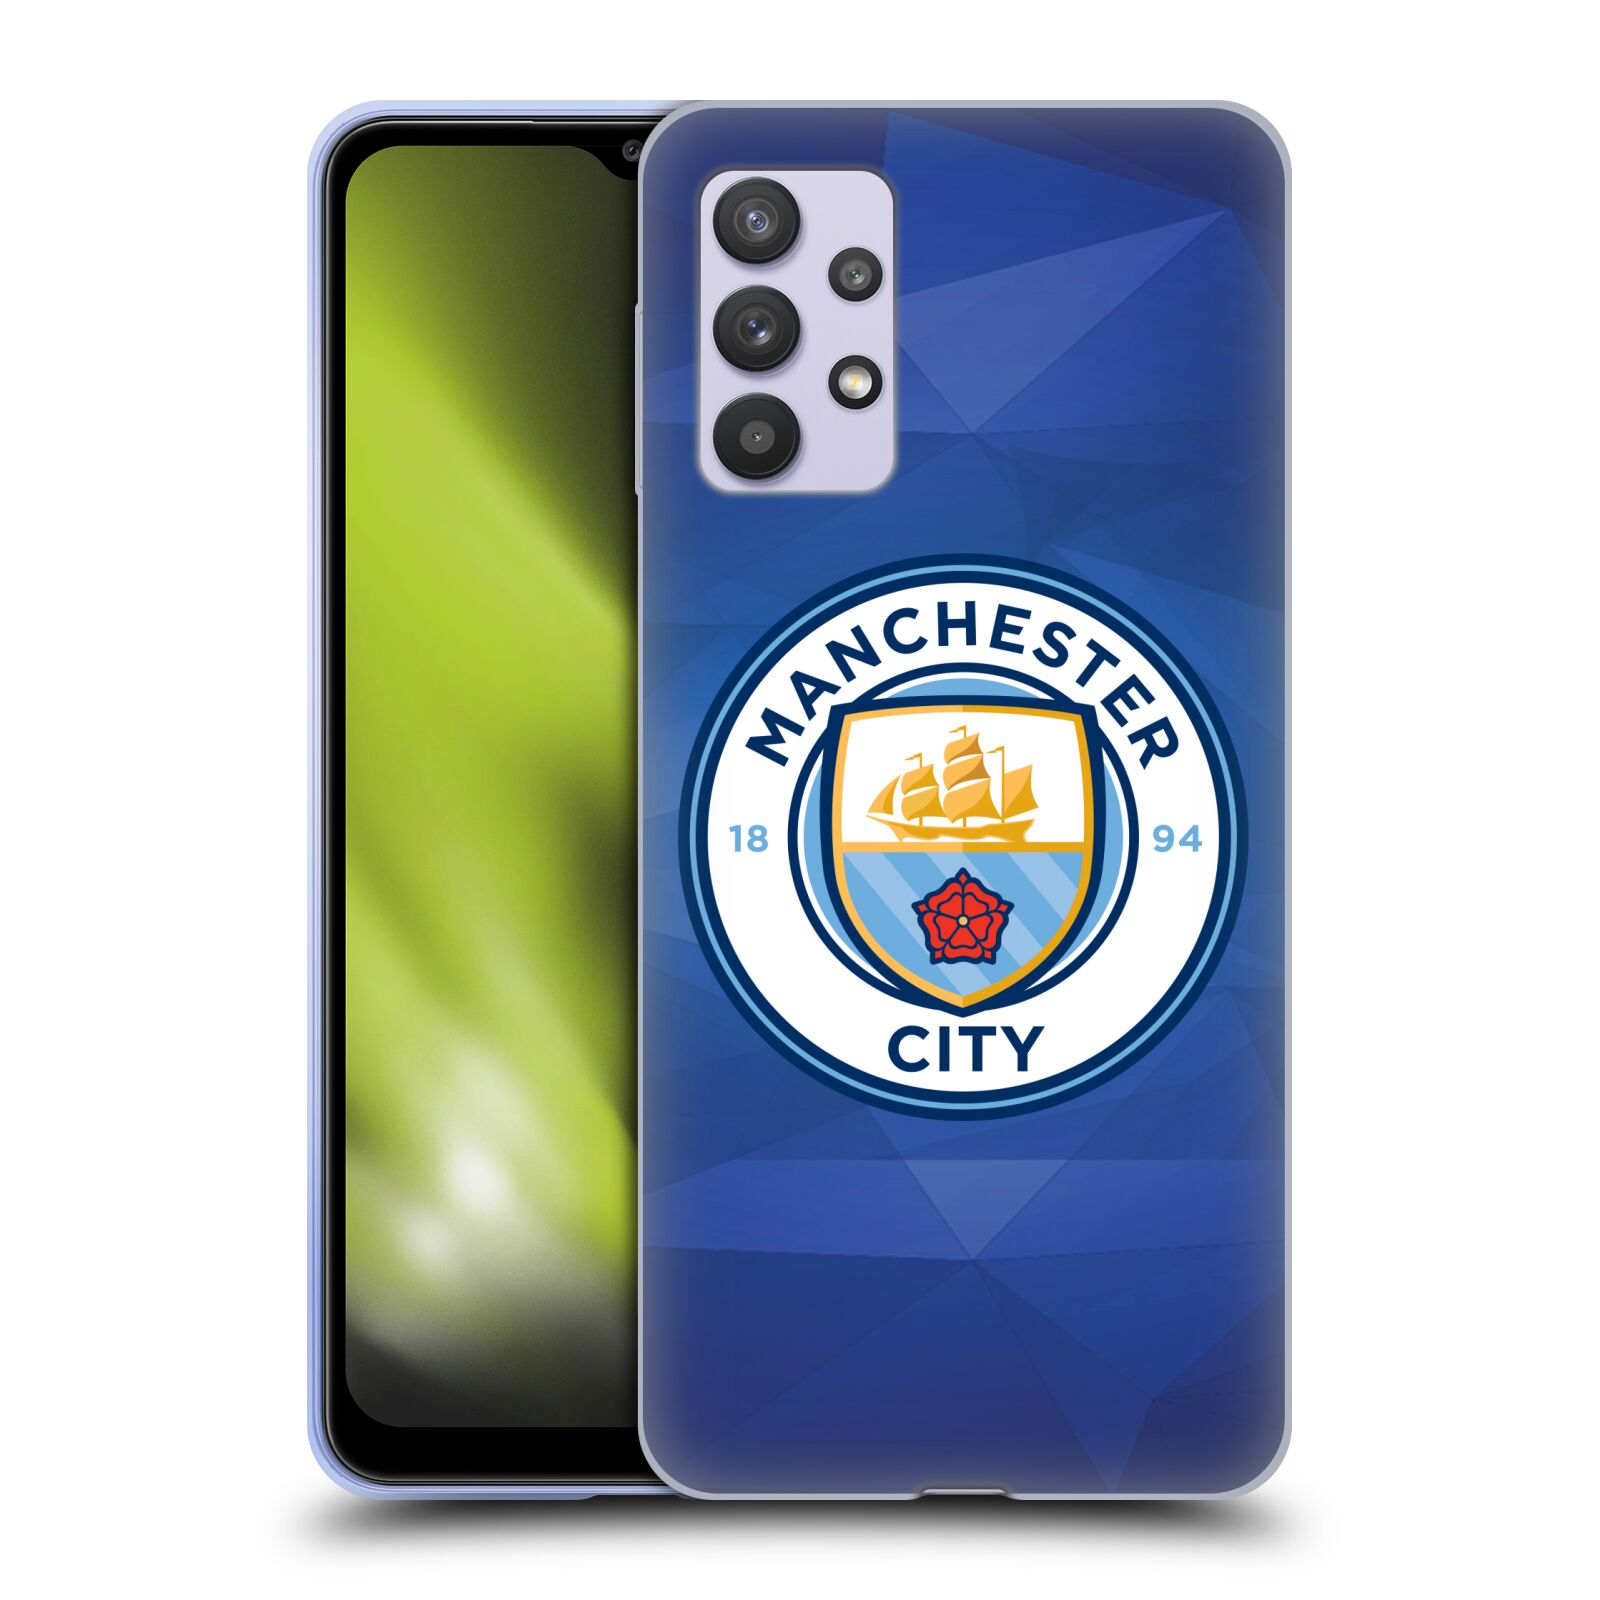 Silikonové pouzdro na mobil Samsung Galaxy A32 5G - Head Case - Manchester City FC - Modré nové logo